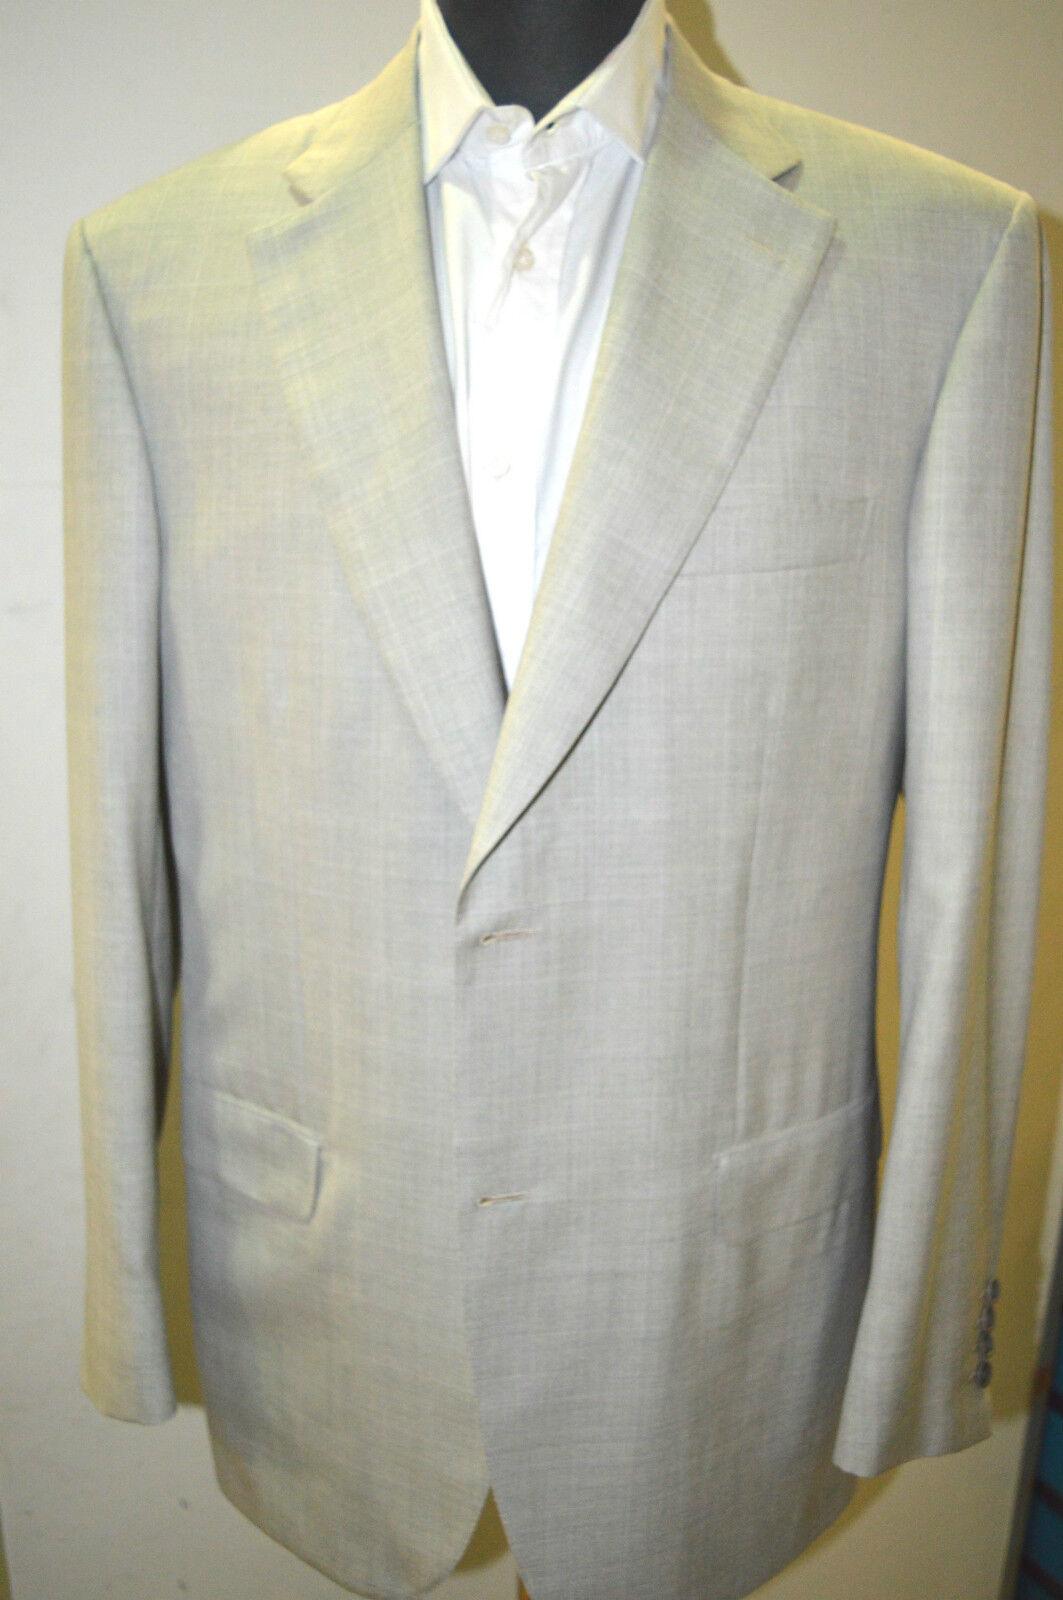 NEW BRIONI   Suit 90% Wool 10% Silk Größe 40 Us 50 Eu 2 BTN  Buttons  (NO31)